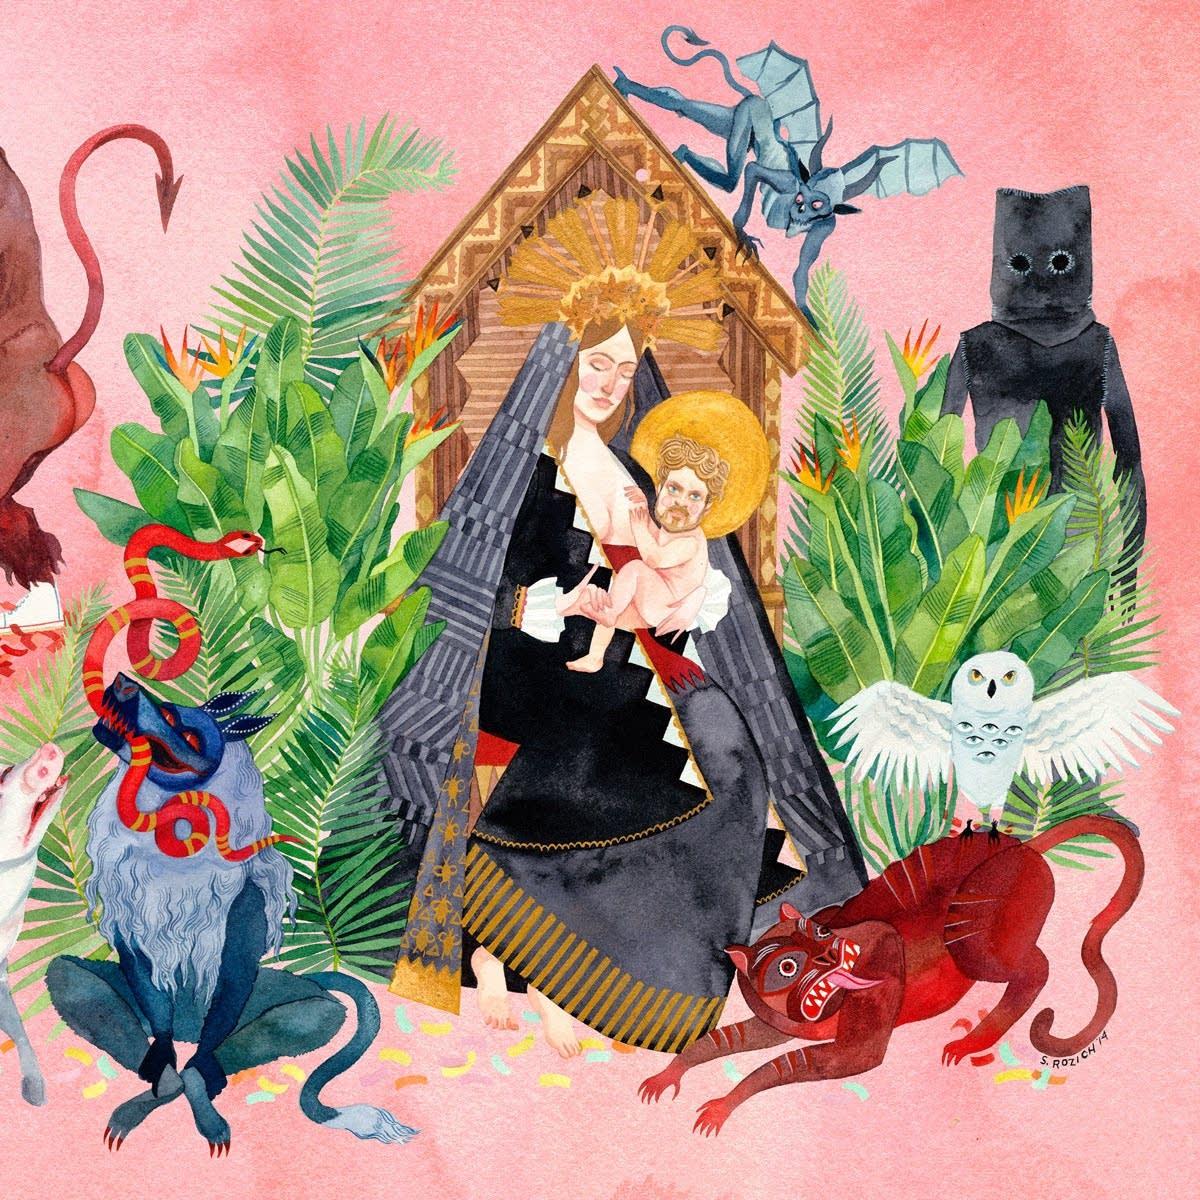 Father John Misty, 'I Love You, Honeybear'